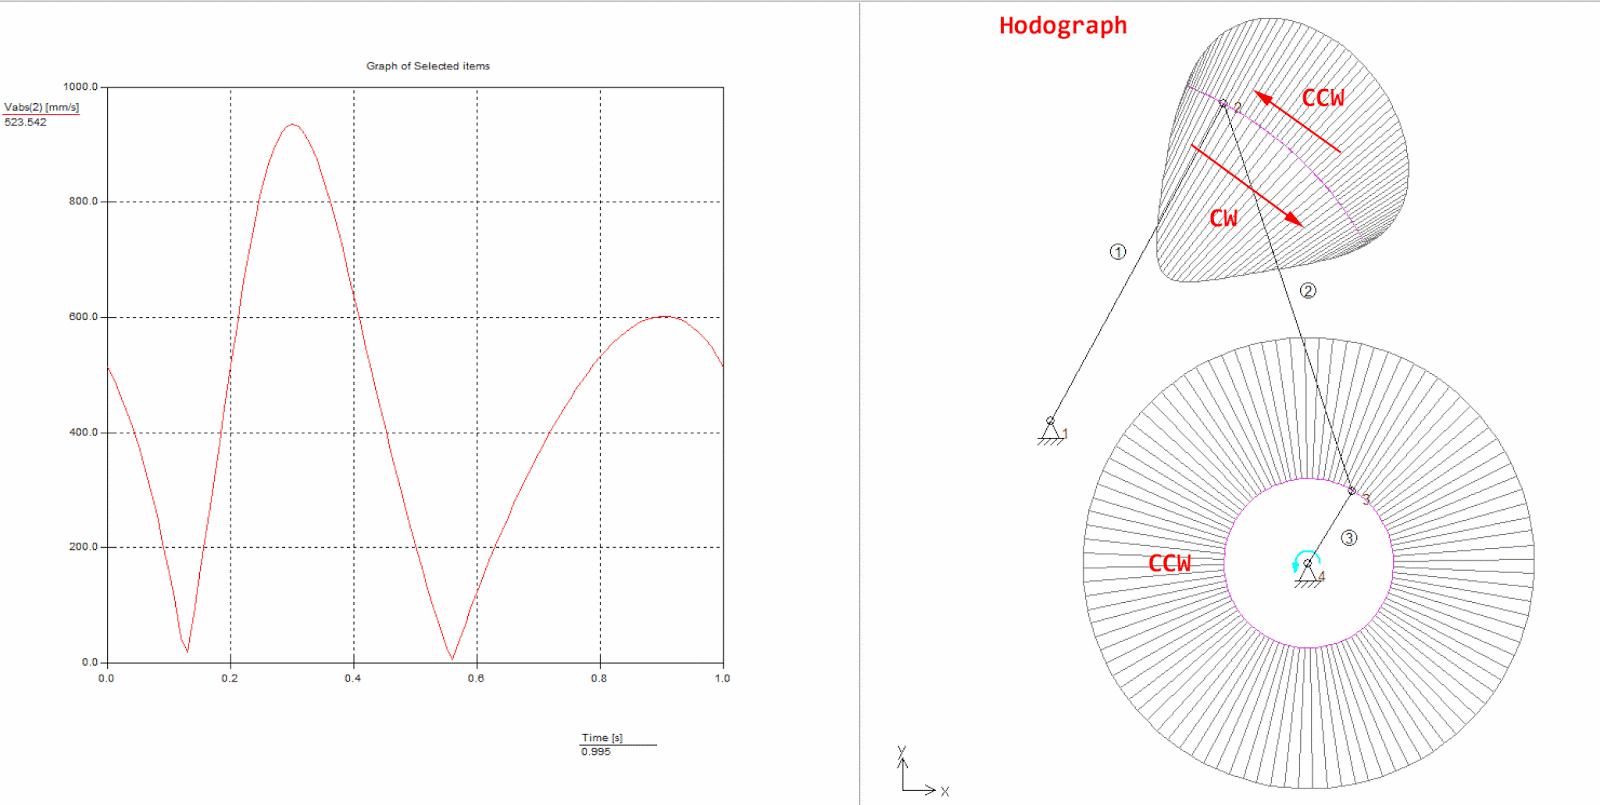 Grashofs criterion crank rocker four bar mechanism ezy mechanic velocity hodograph in sam 70 the ultimate mechanism designer ccuart Image collections